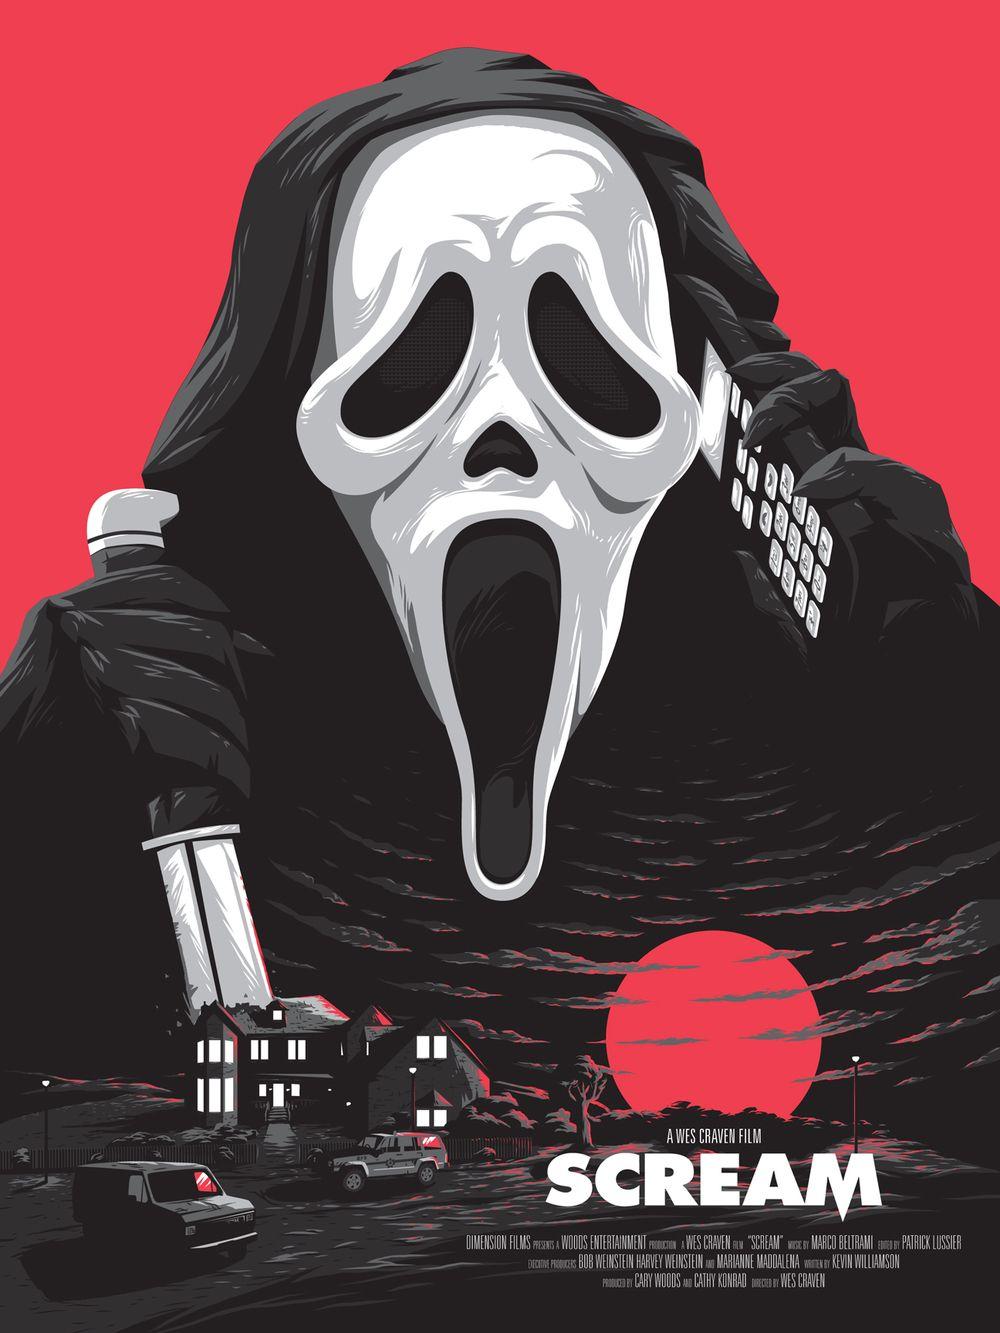 Scream 1996 hd wallpaper from scream